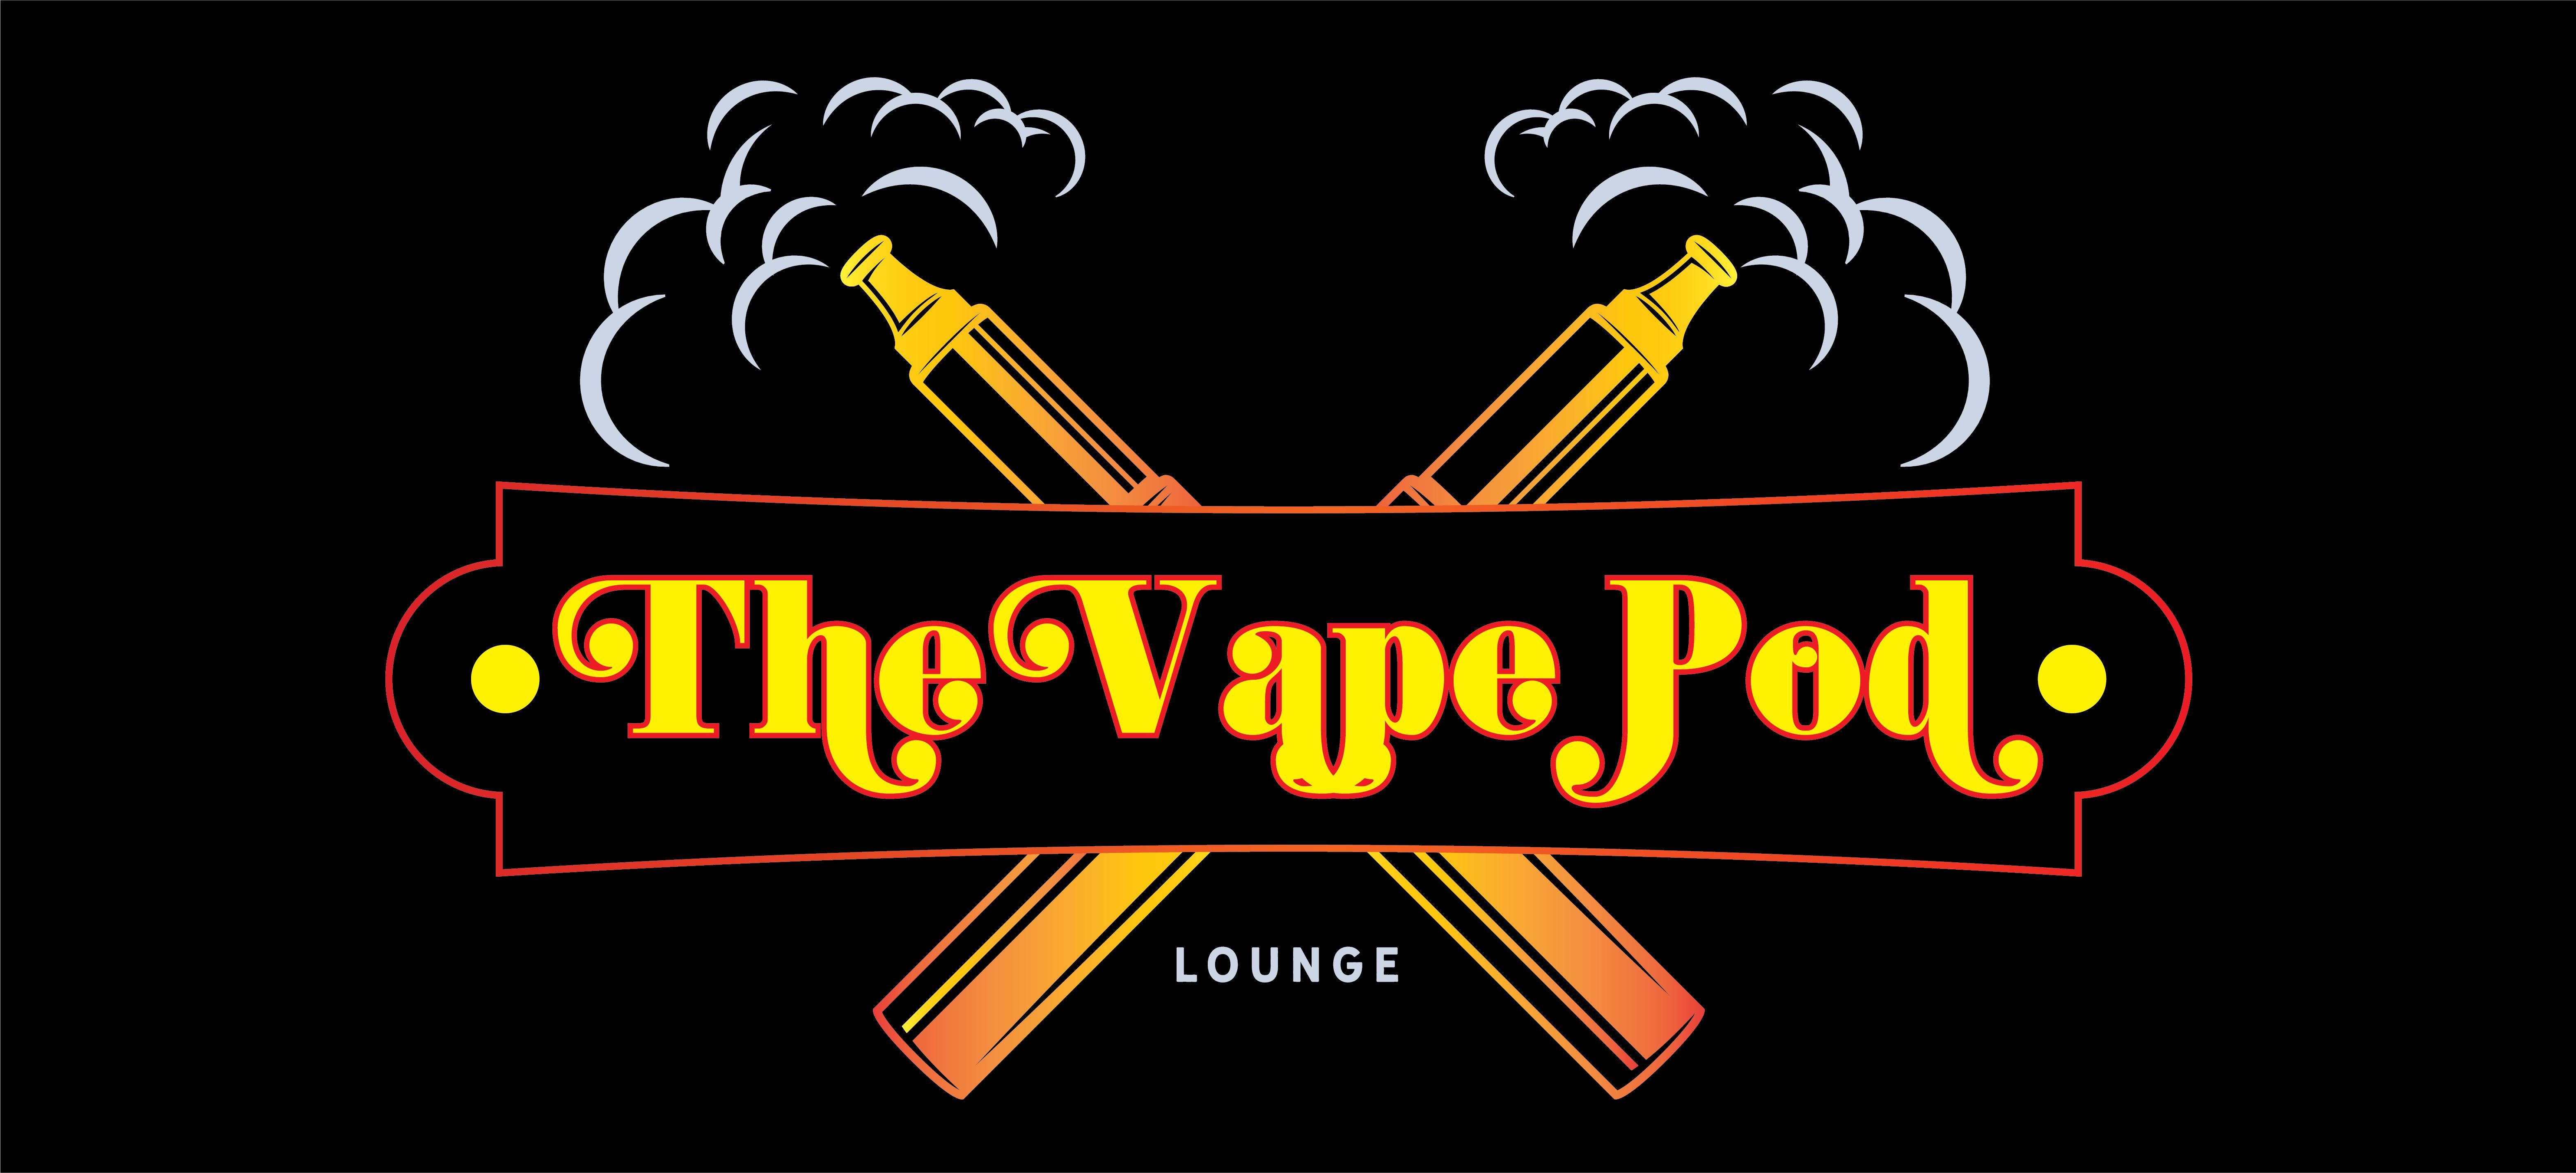 The Vape Pod